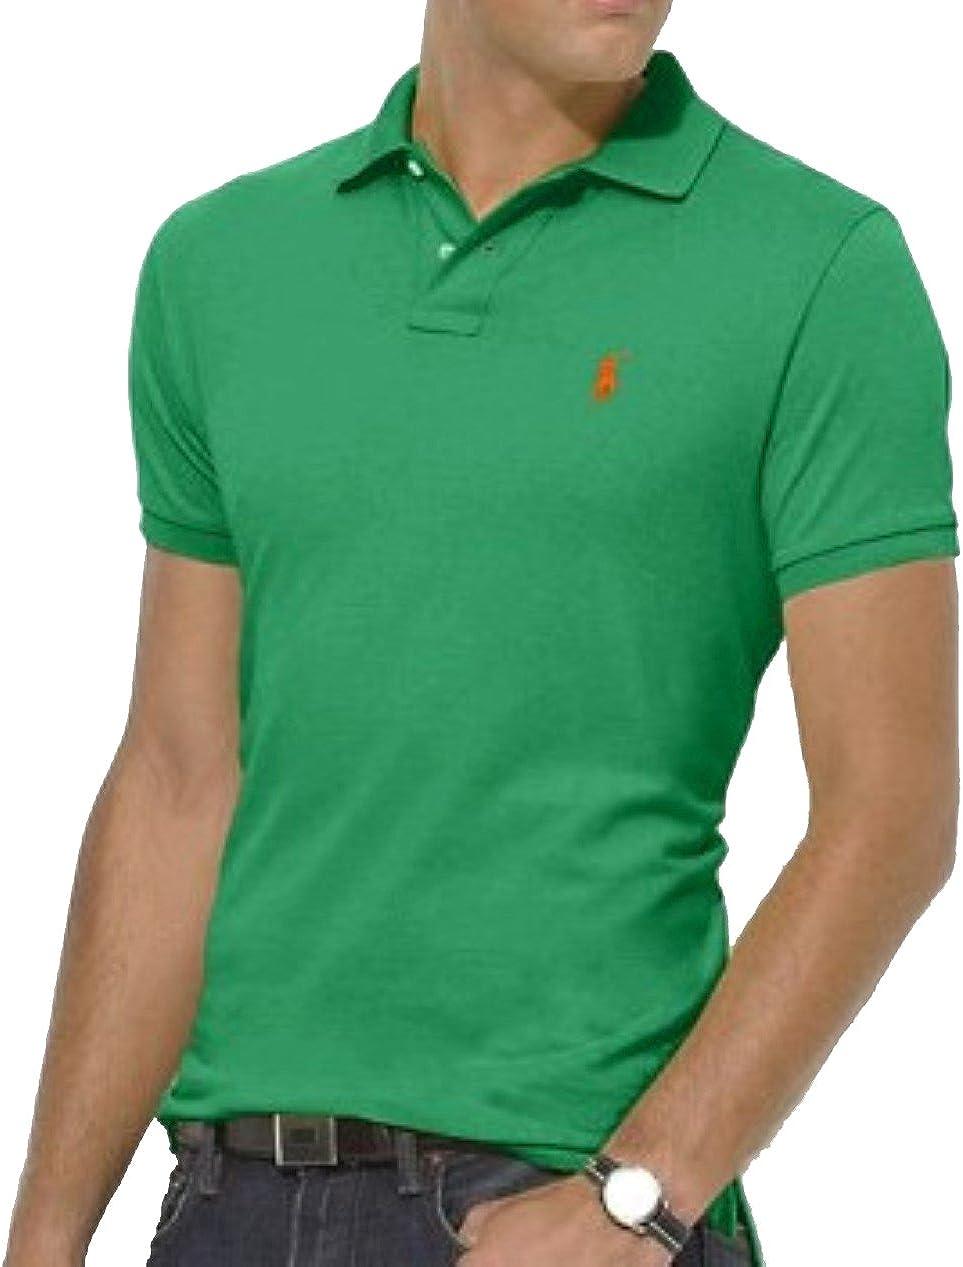 Polo Ralph Lauren - Camiseta de manga corta - para niño ...